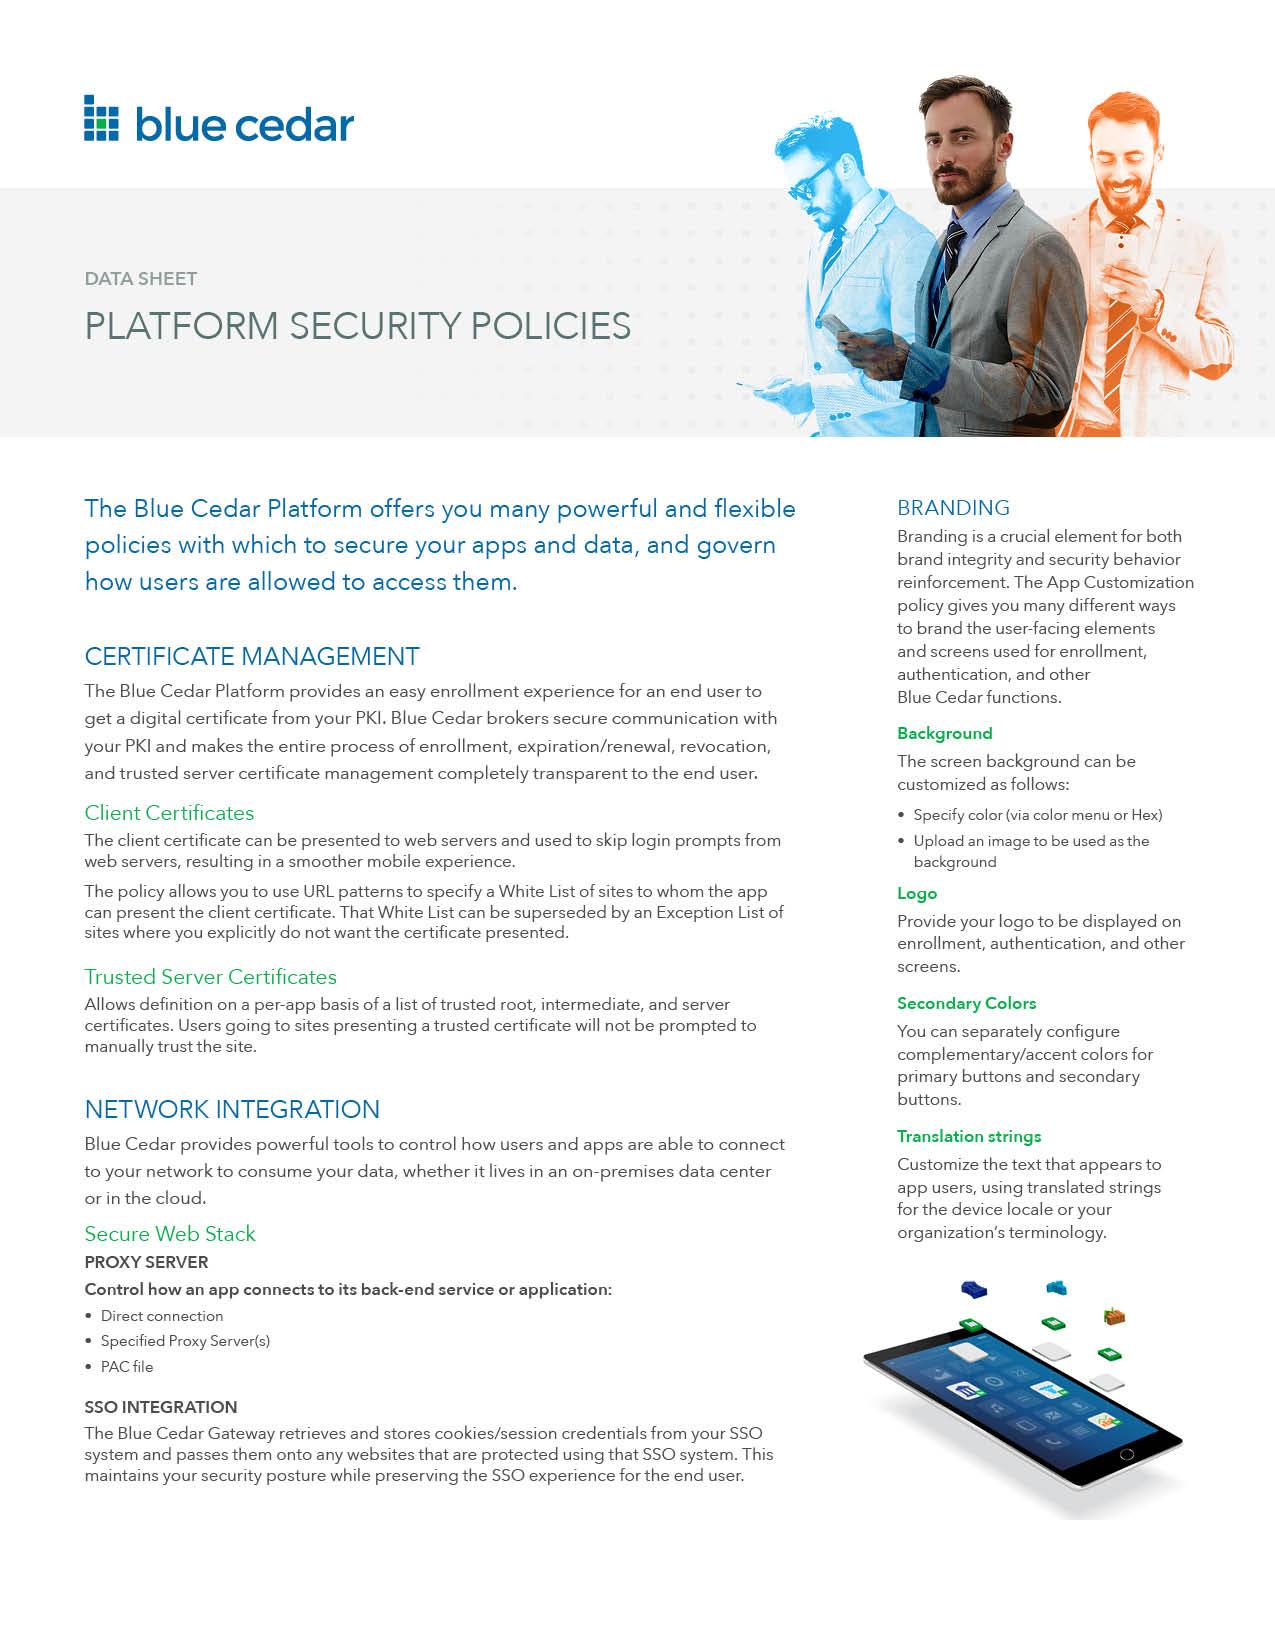 Blue Cedar Security Policies